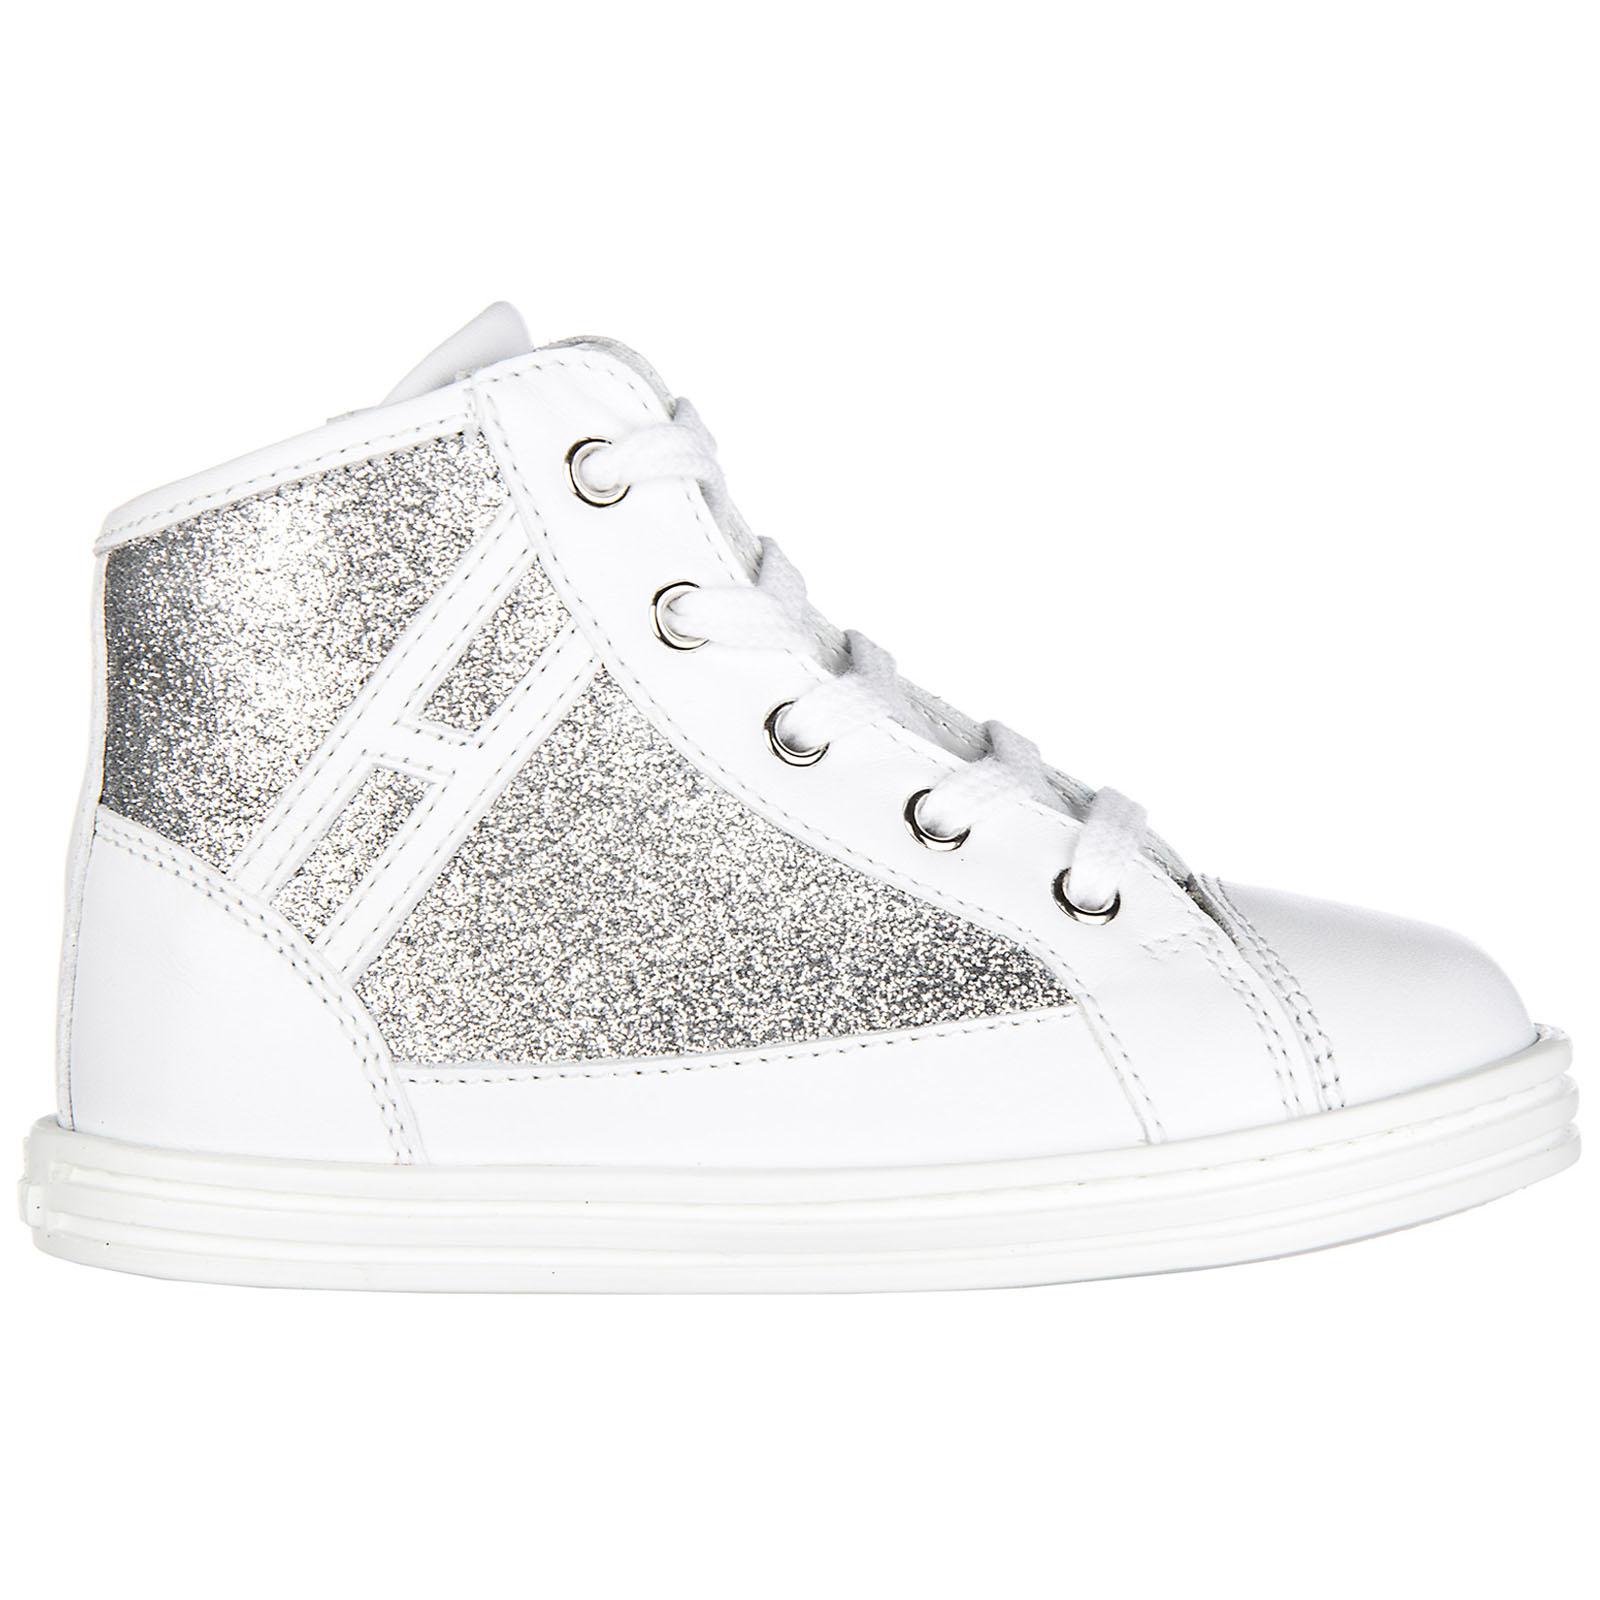 Scarpe sneakers bimba bambina alte pelle r141 polacco zip ... 862441ef909